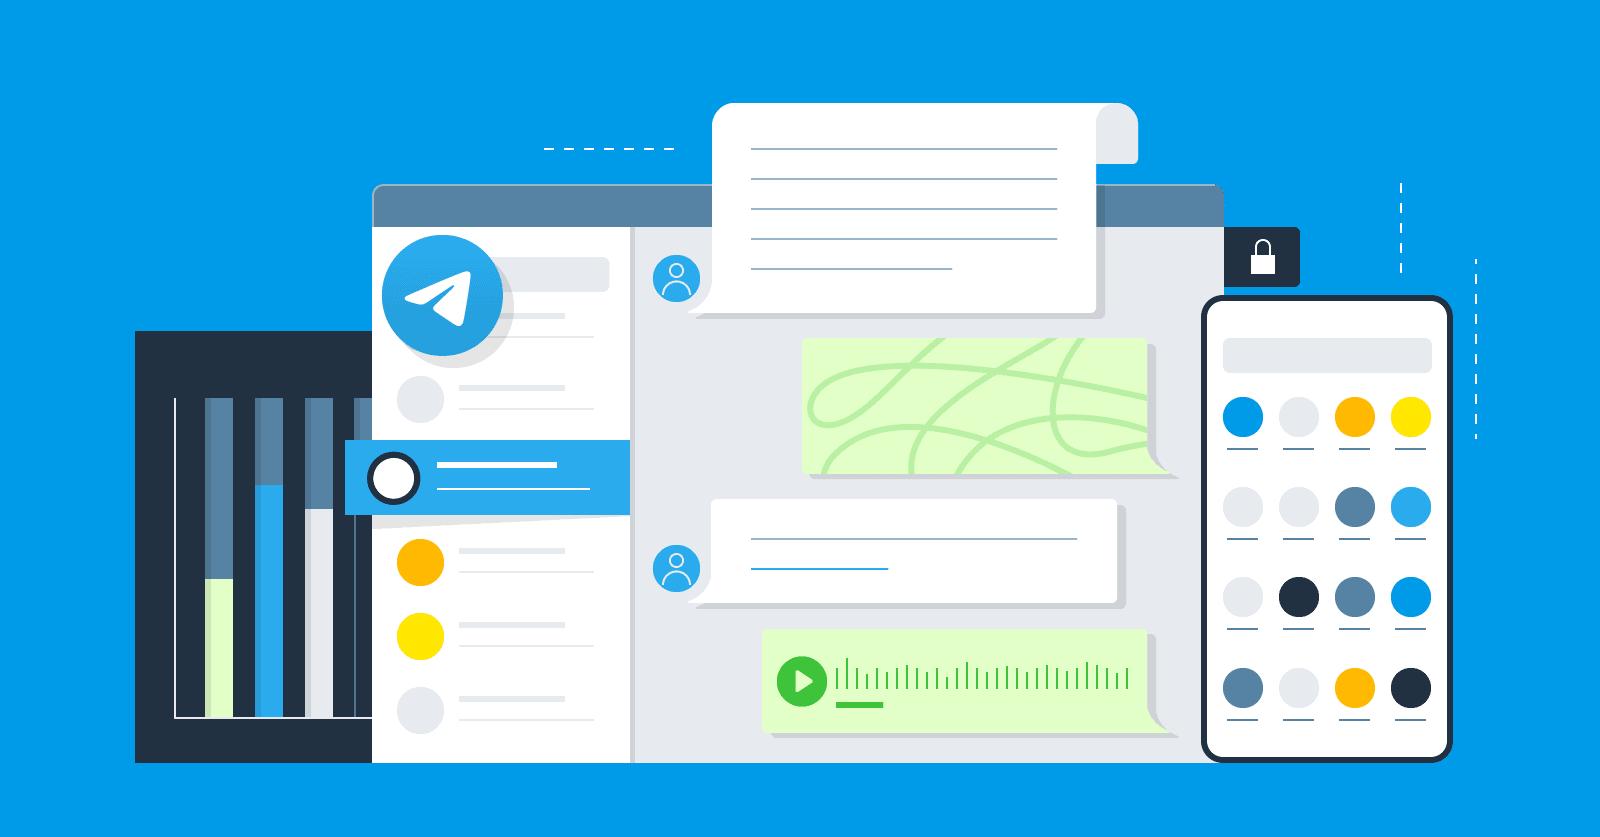 Telegram Usage and Growth Statistics: How Many People Use Telegram?